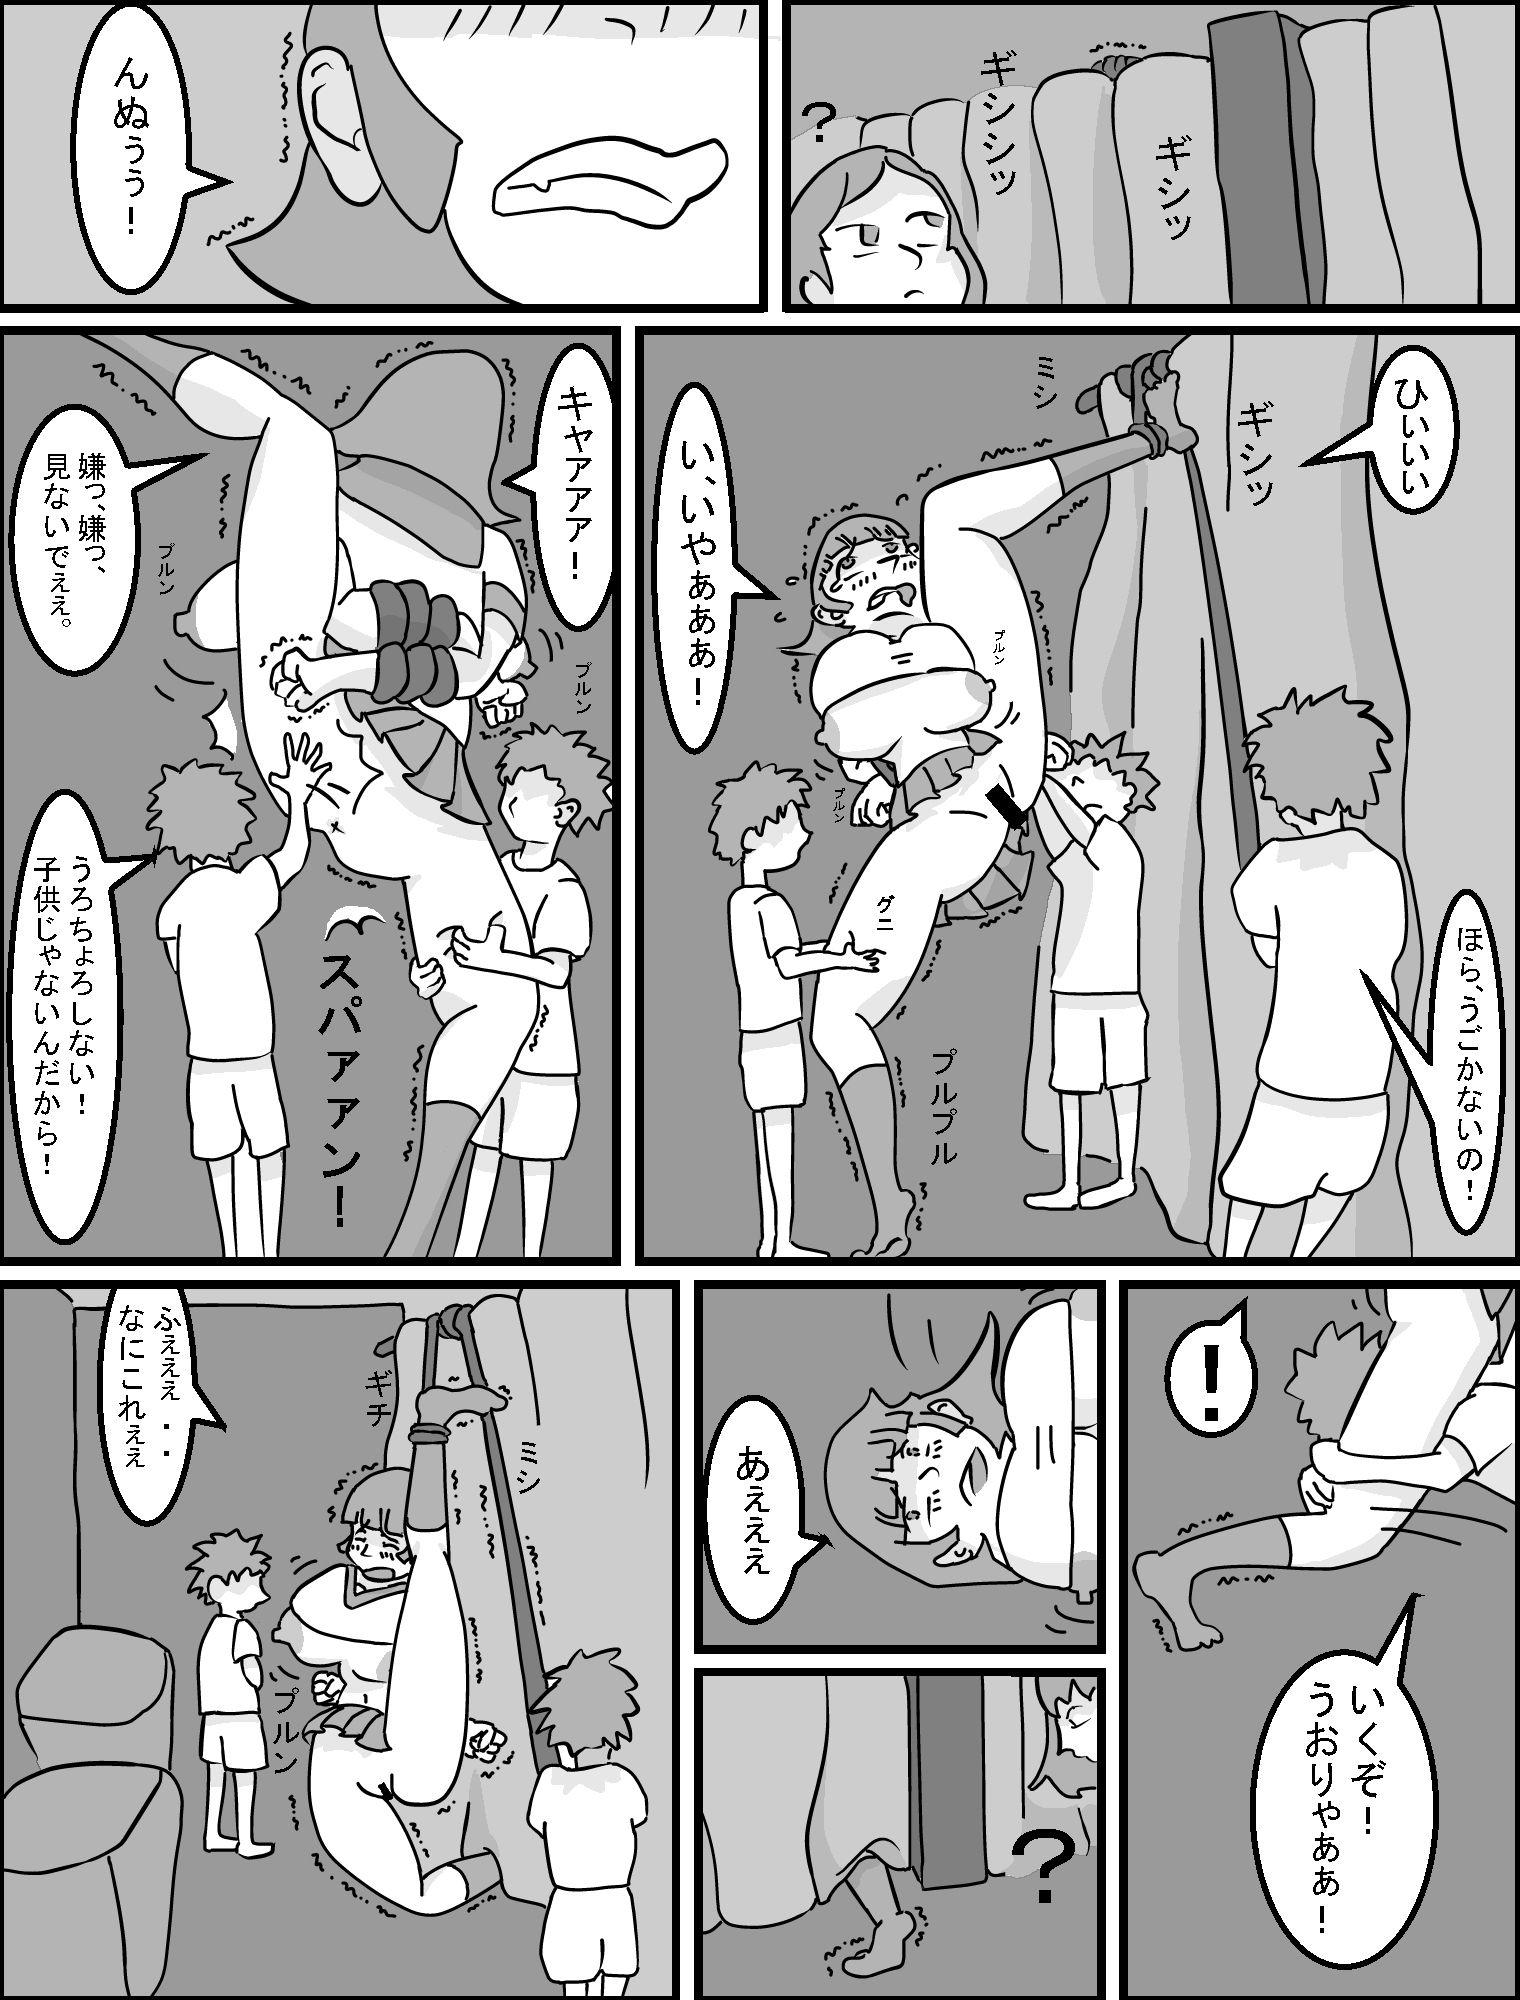 【machildaシステム 同人】おねリョナ2(大量94ページ漫画)極悪サスマタ・プール地獄編